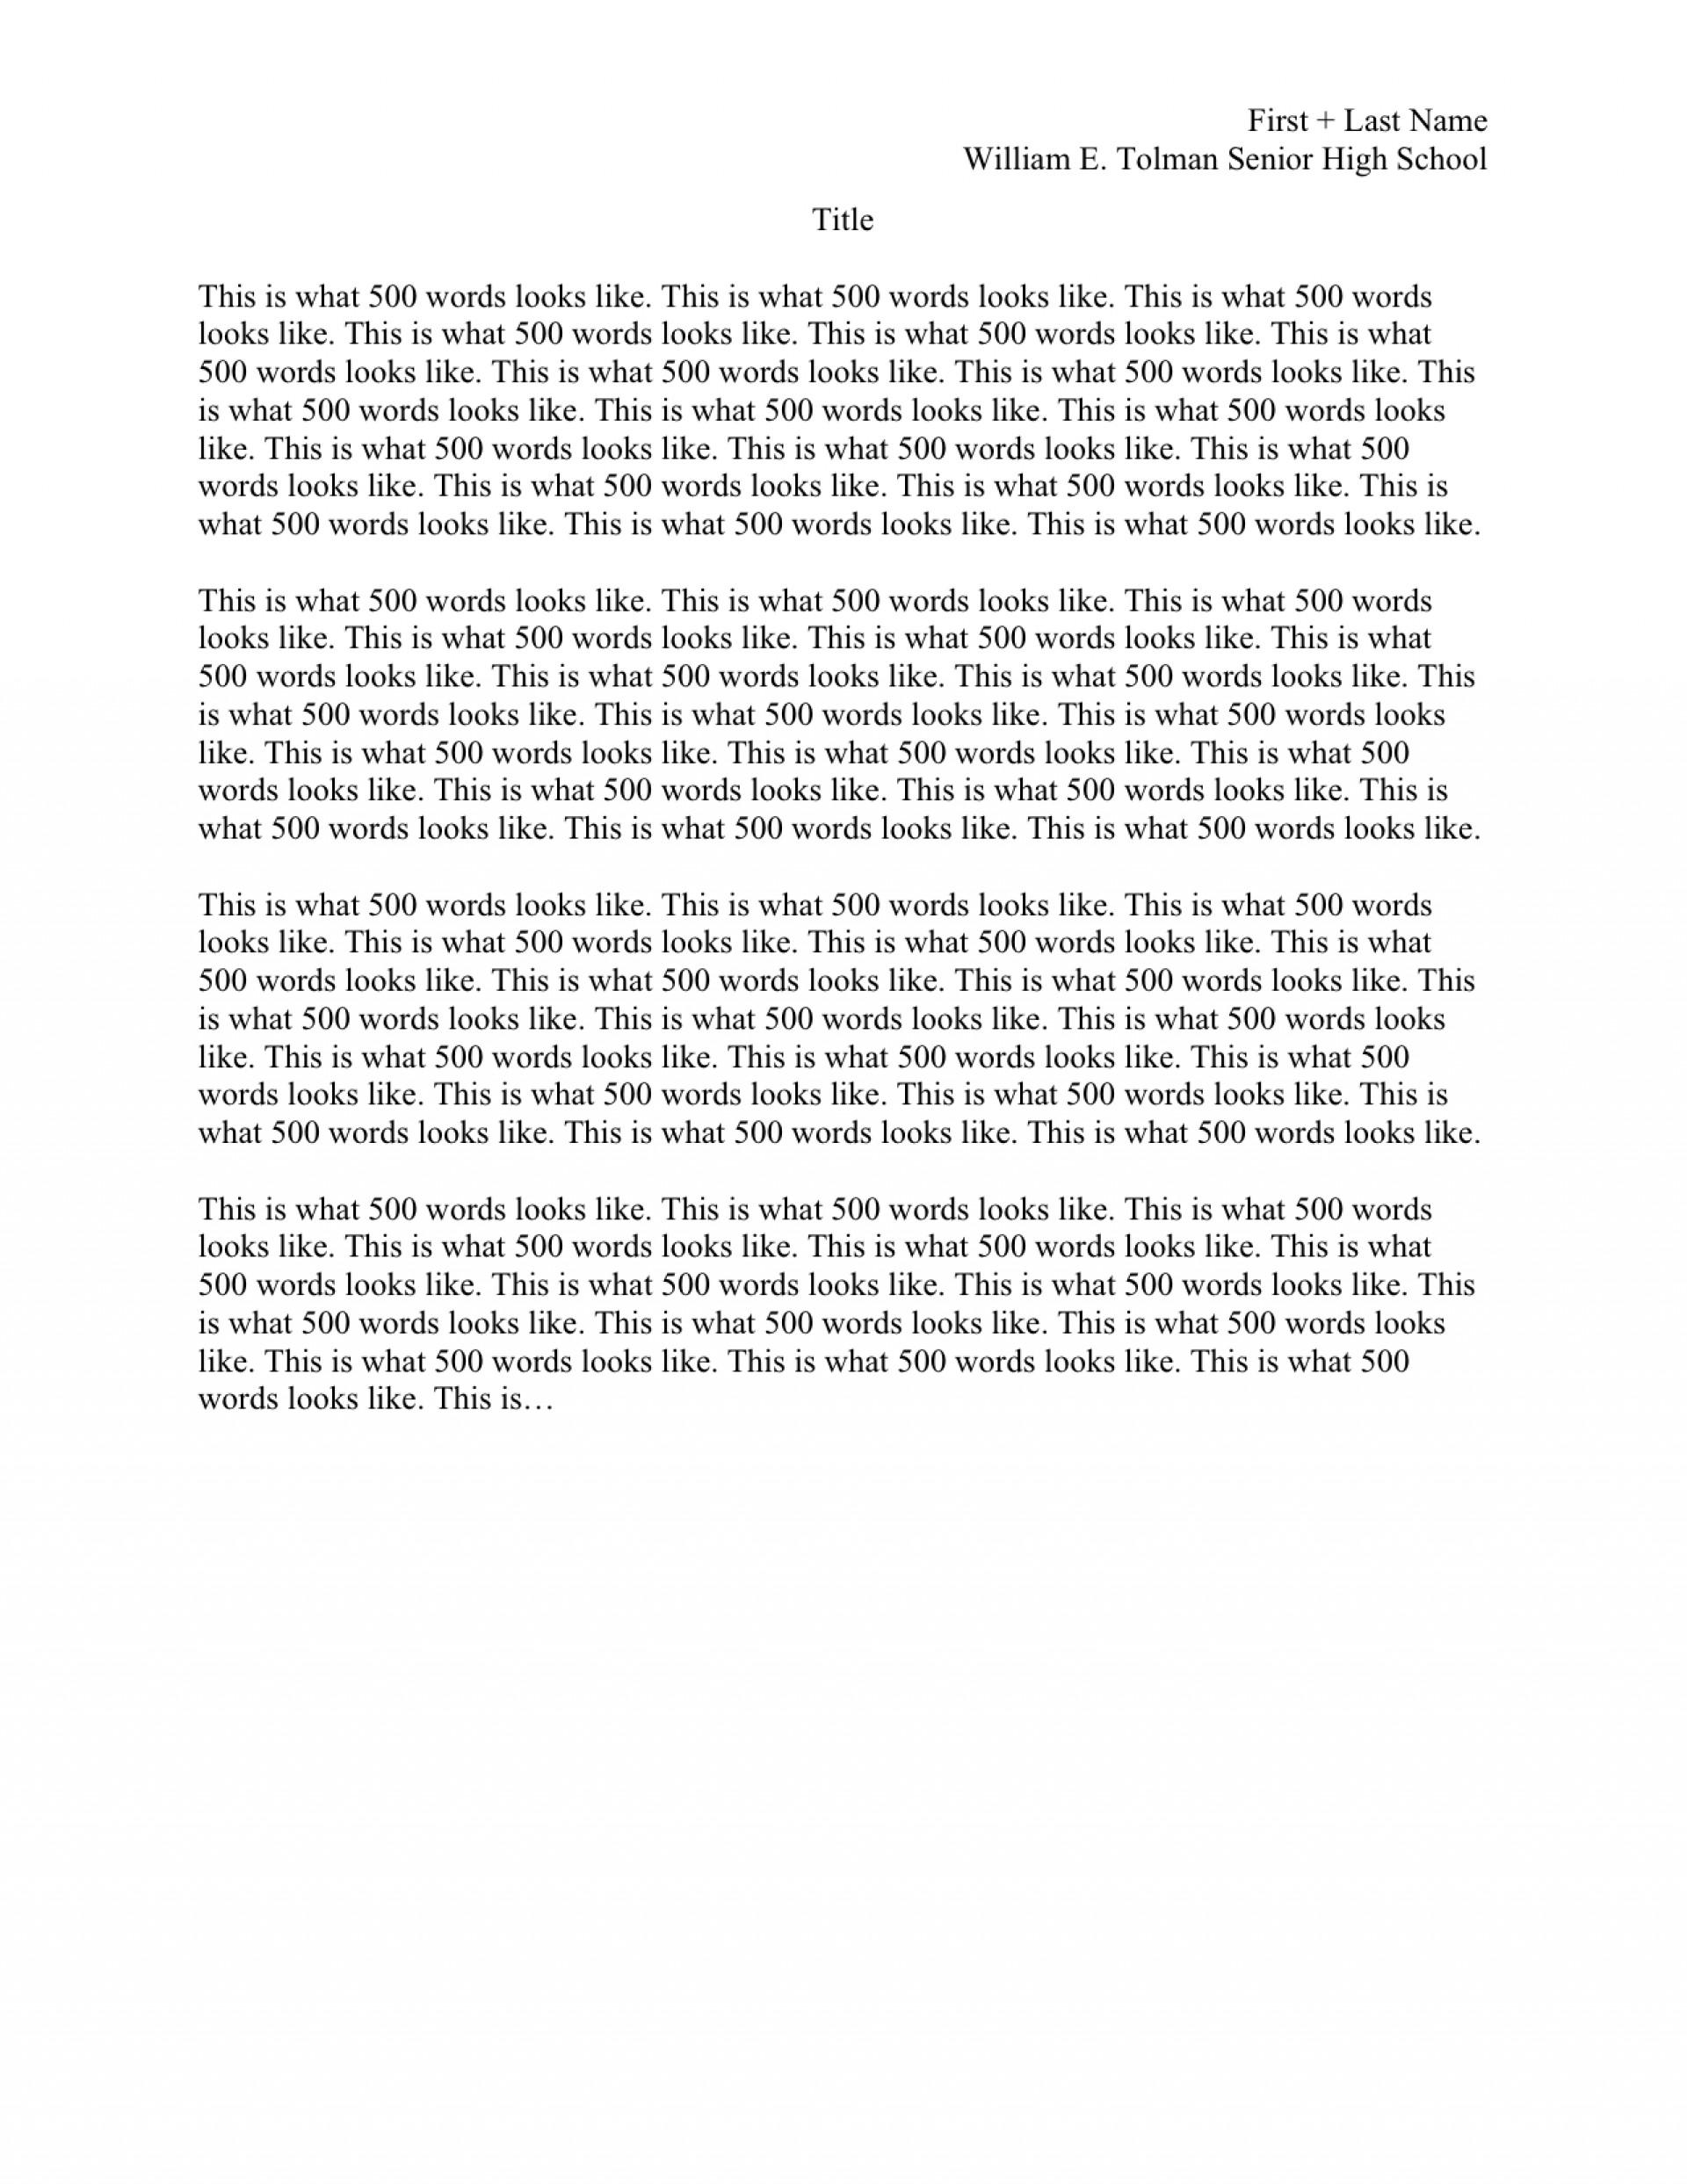 012 Essay Example Write Essays For Money College Best University High School Reddit 1920